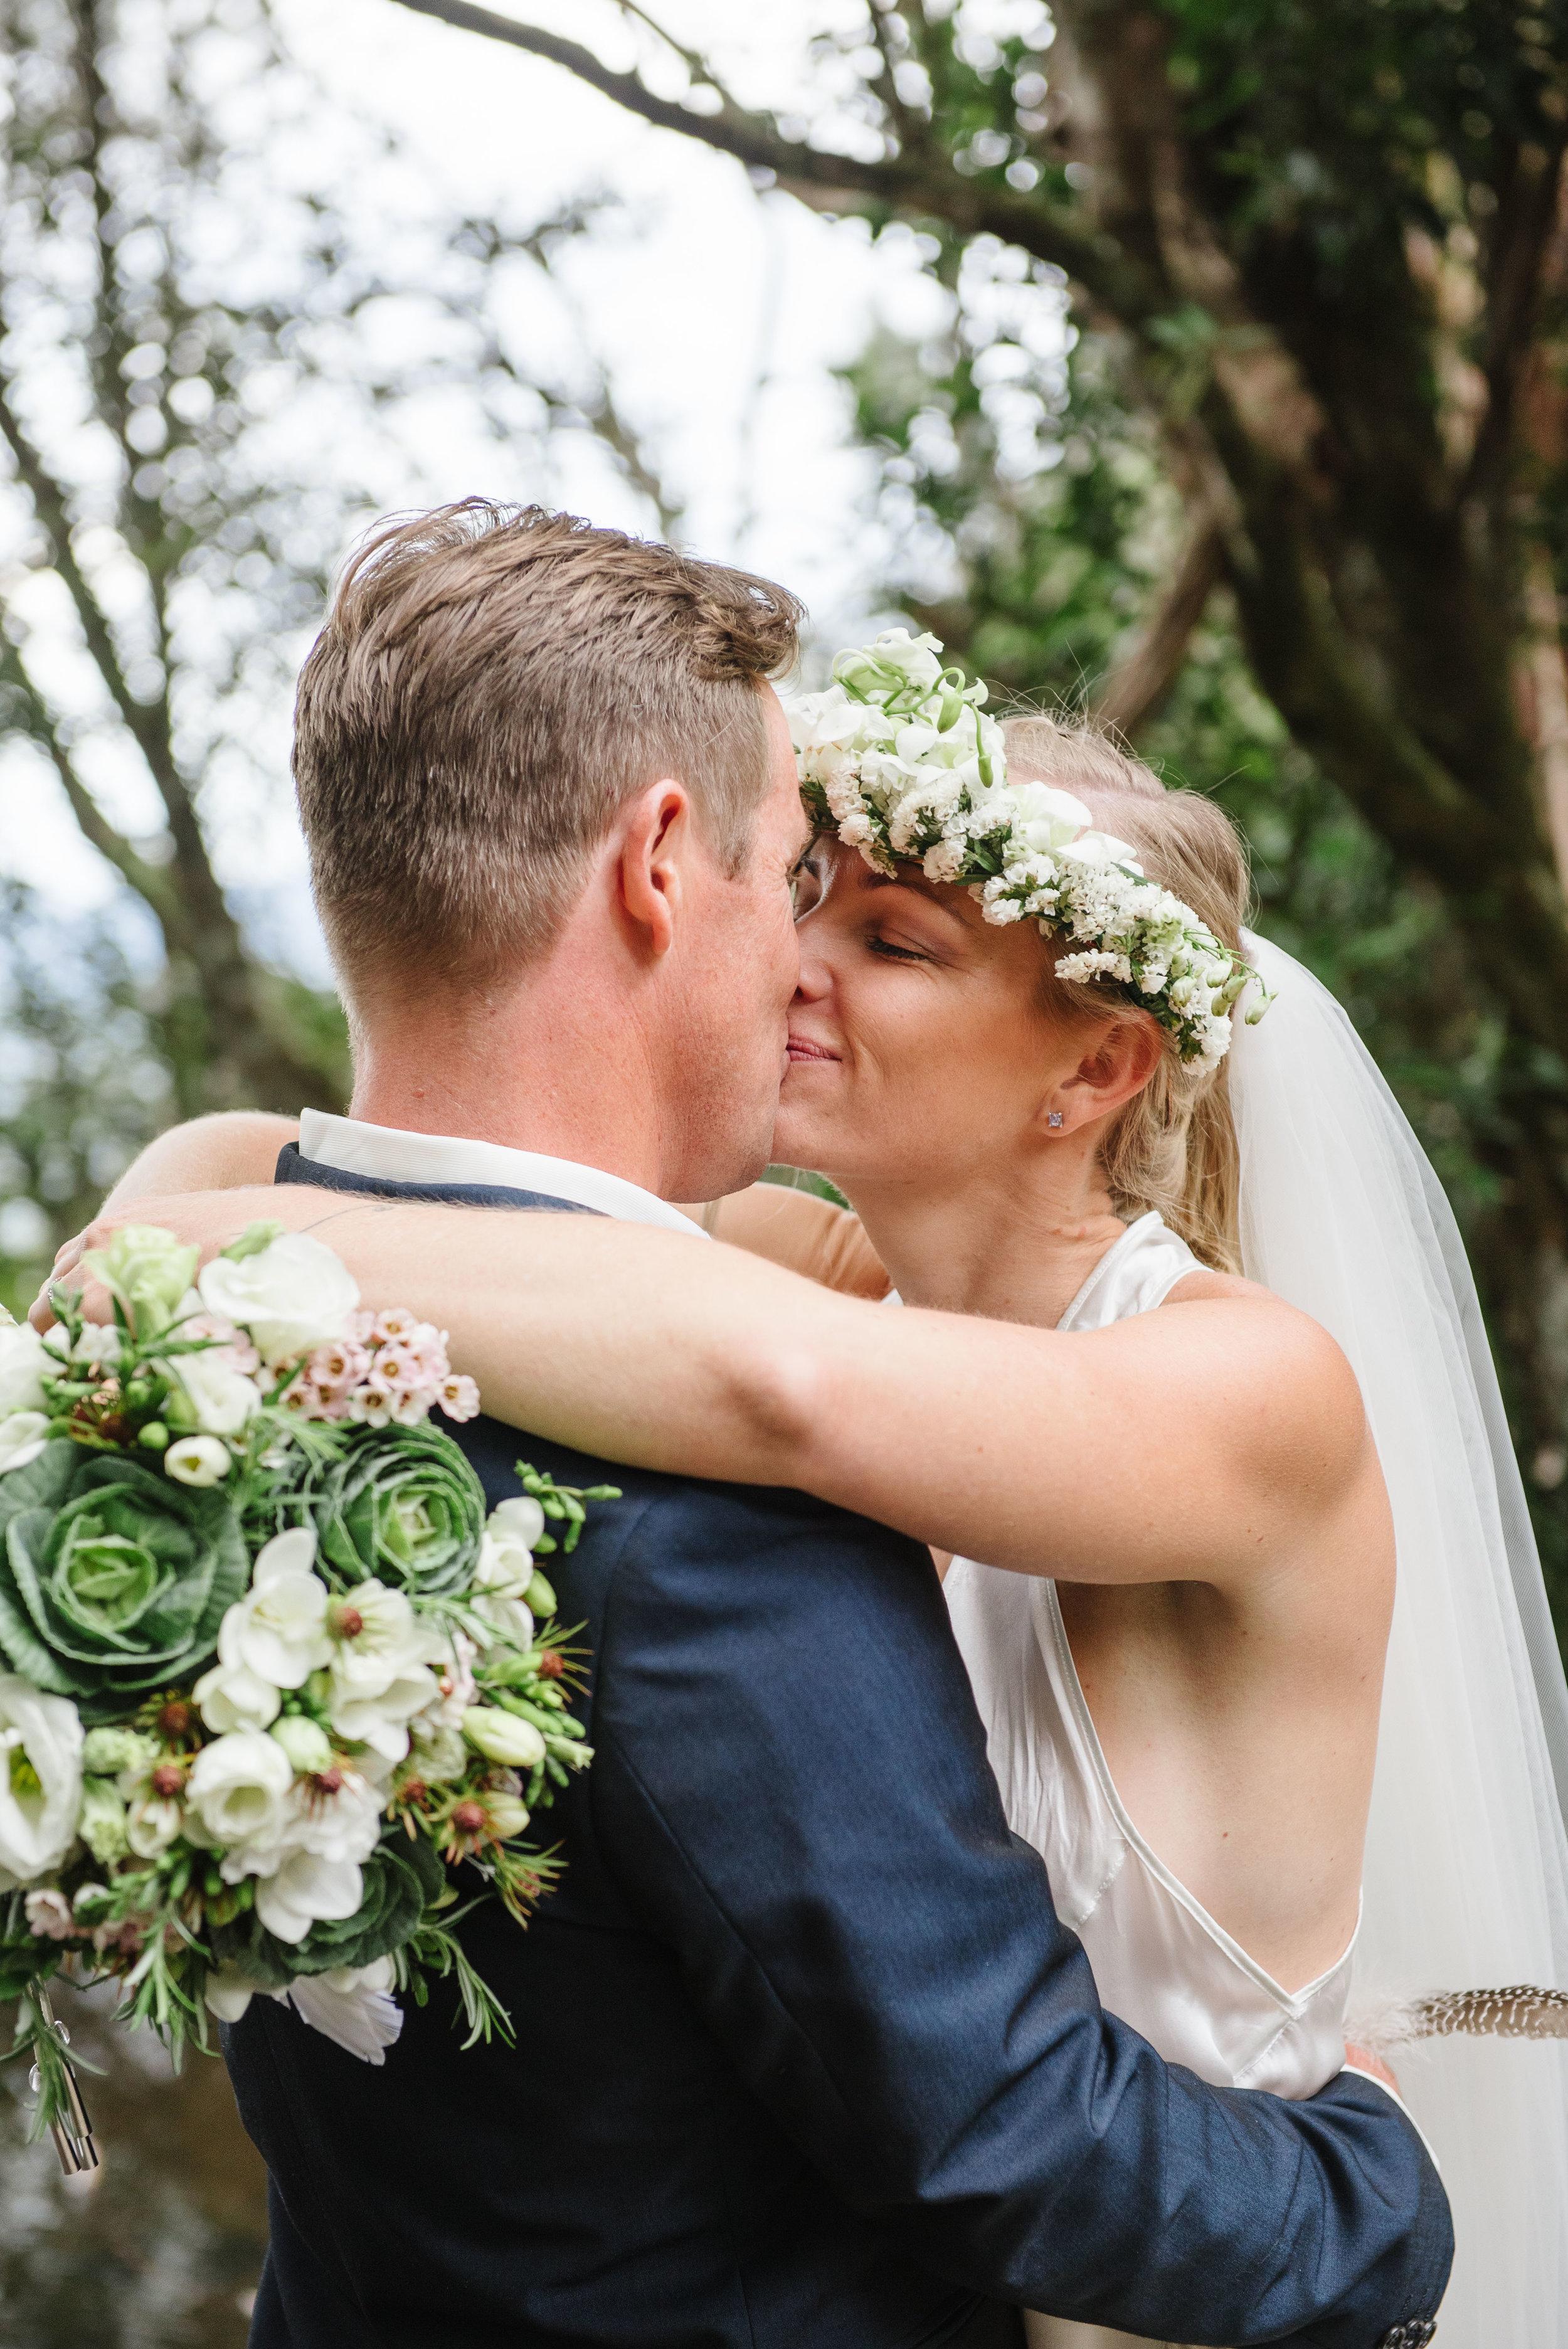 Carla and Luke- wedding photographer, byron bay wedding and family photographer, tweed heads wedding and family photography-280.jpg